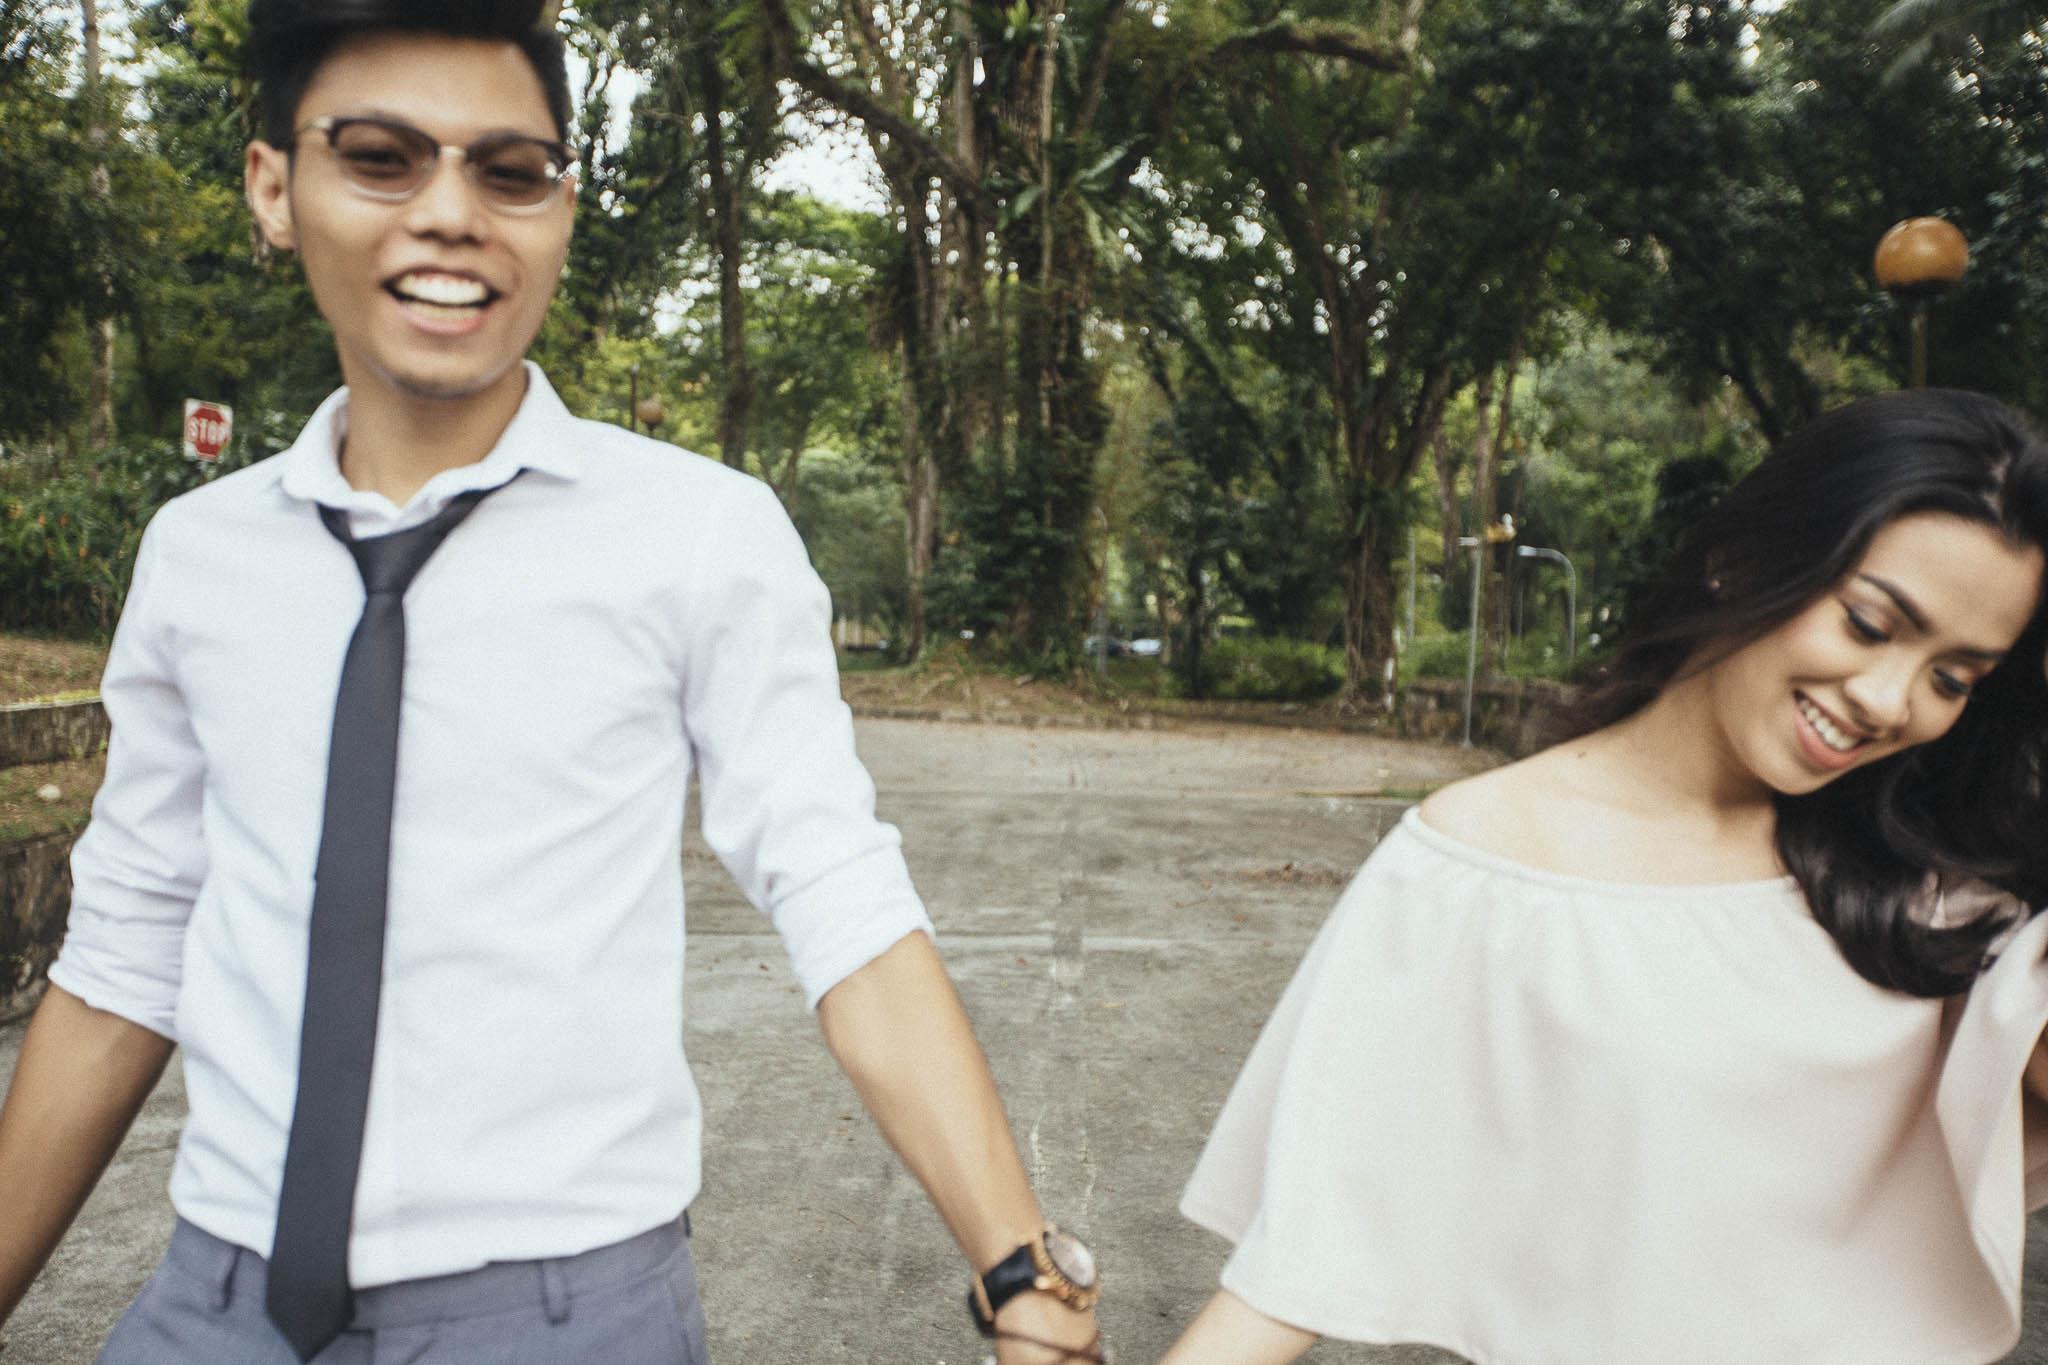 singapore-wedding-photographer-malay-travel-adli-tashah-14.jpg